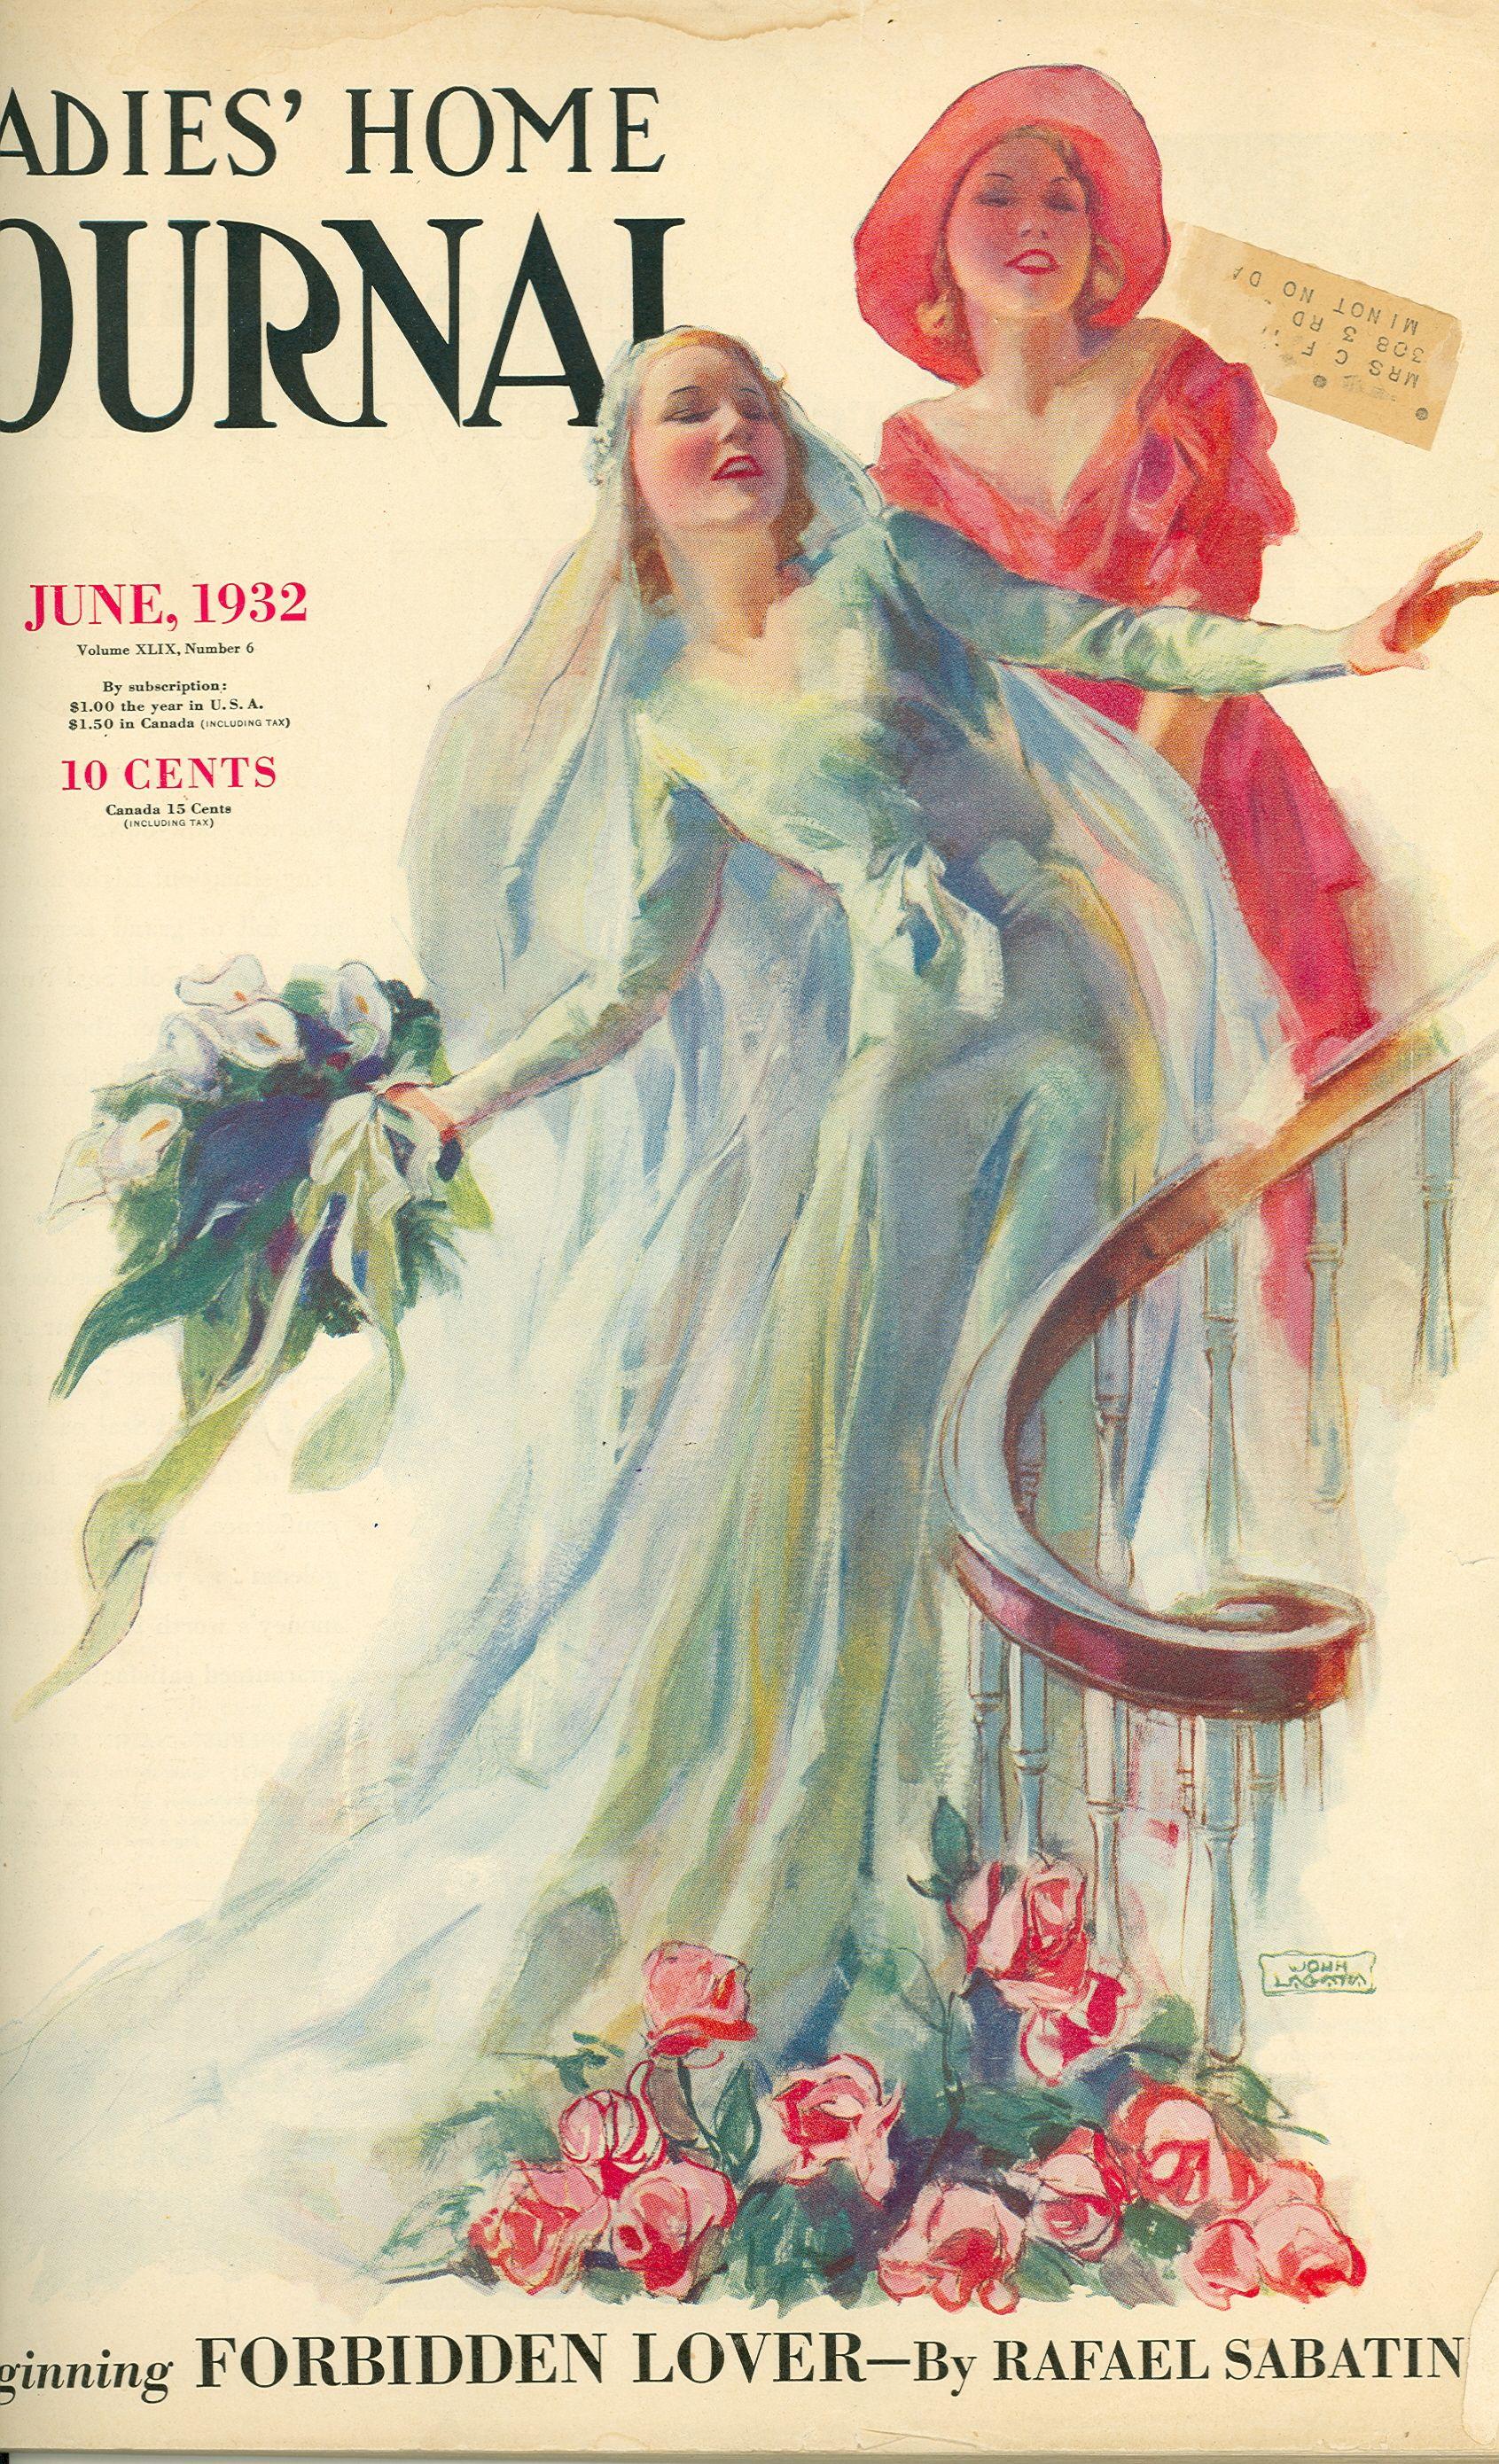 Ladies Home Journal Cover June 1932 Magazine Cover Vintage Illustration Vintage Magazine